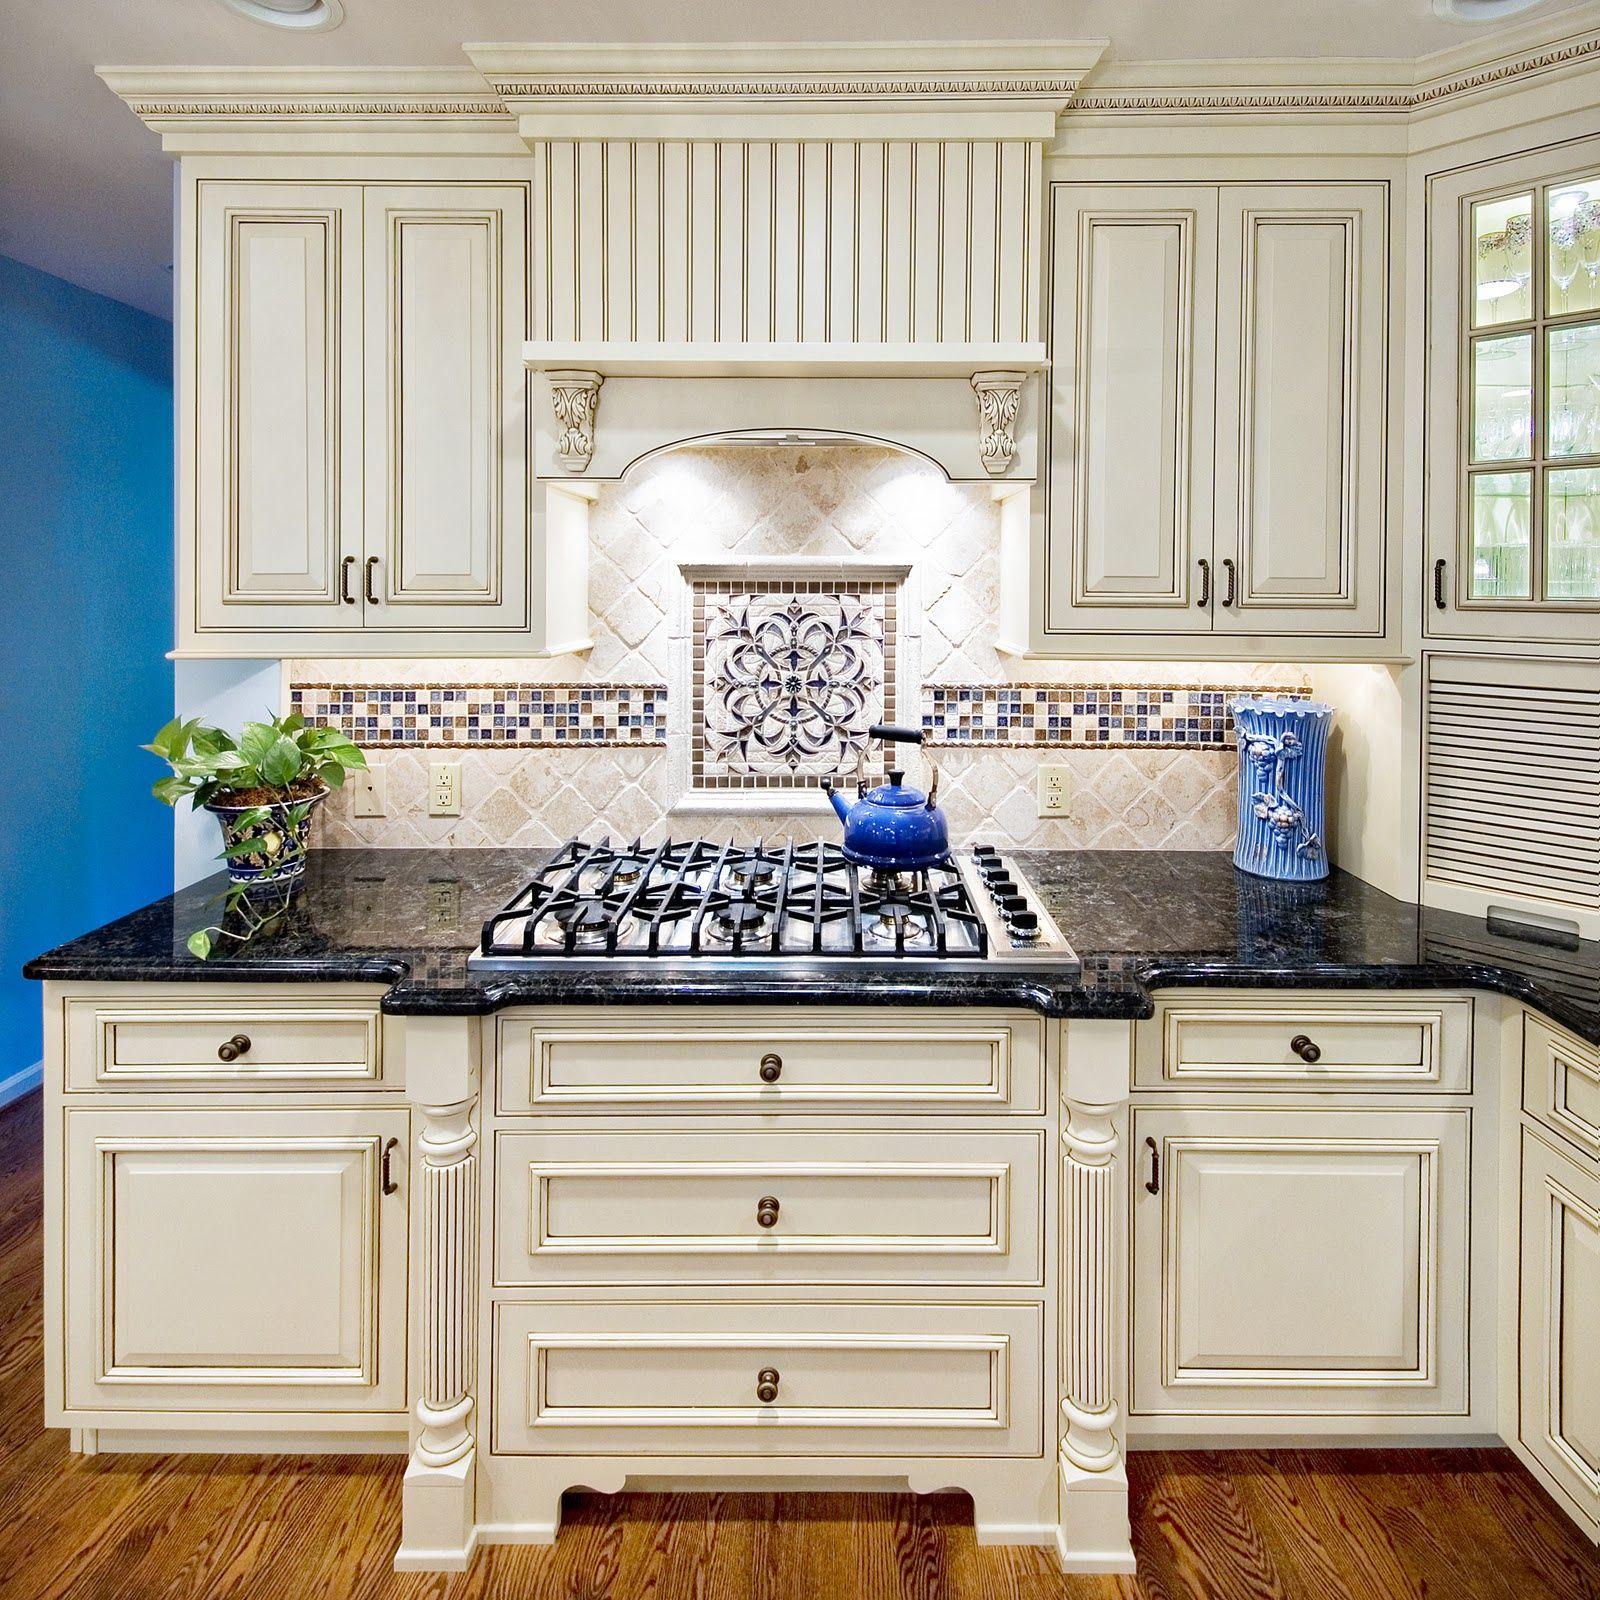 Wonderful 77+ Granite Countertops With Tile Backsplash Ideas   Kitchen Shelf Display  Ideas Check More At